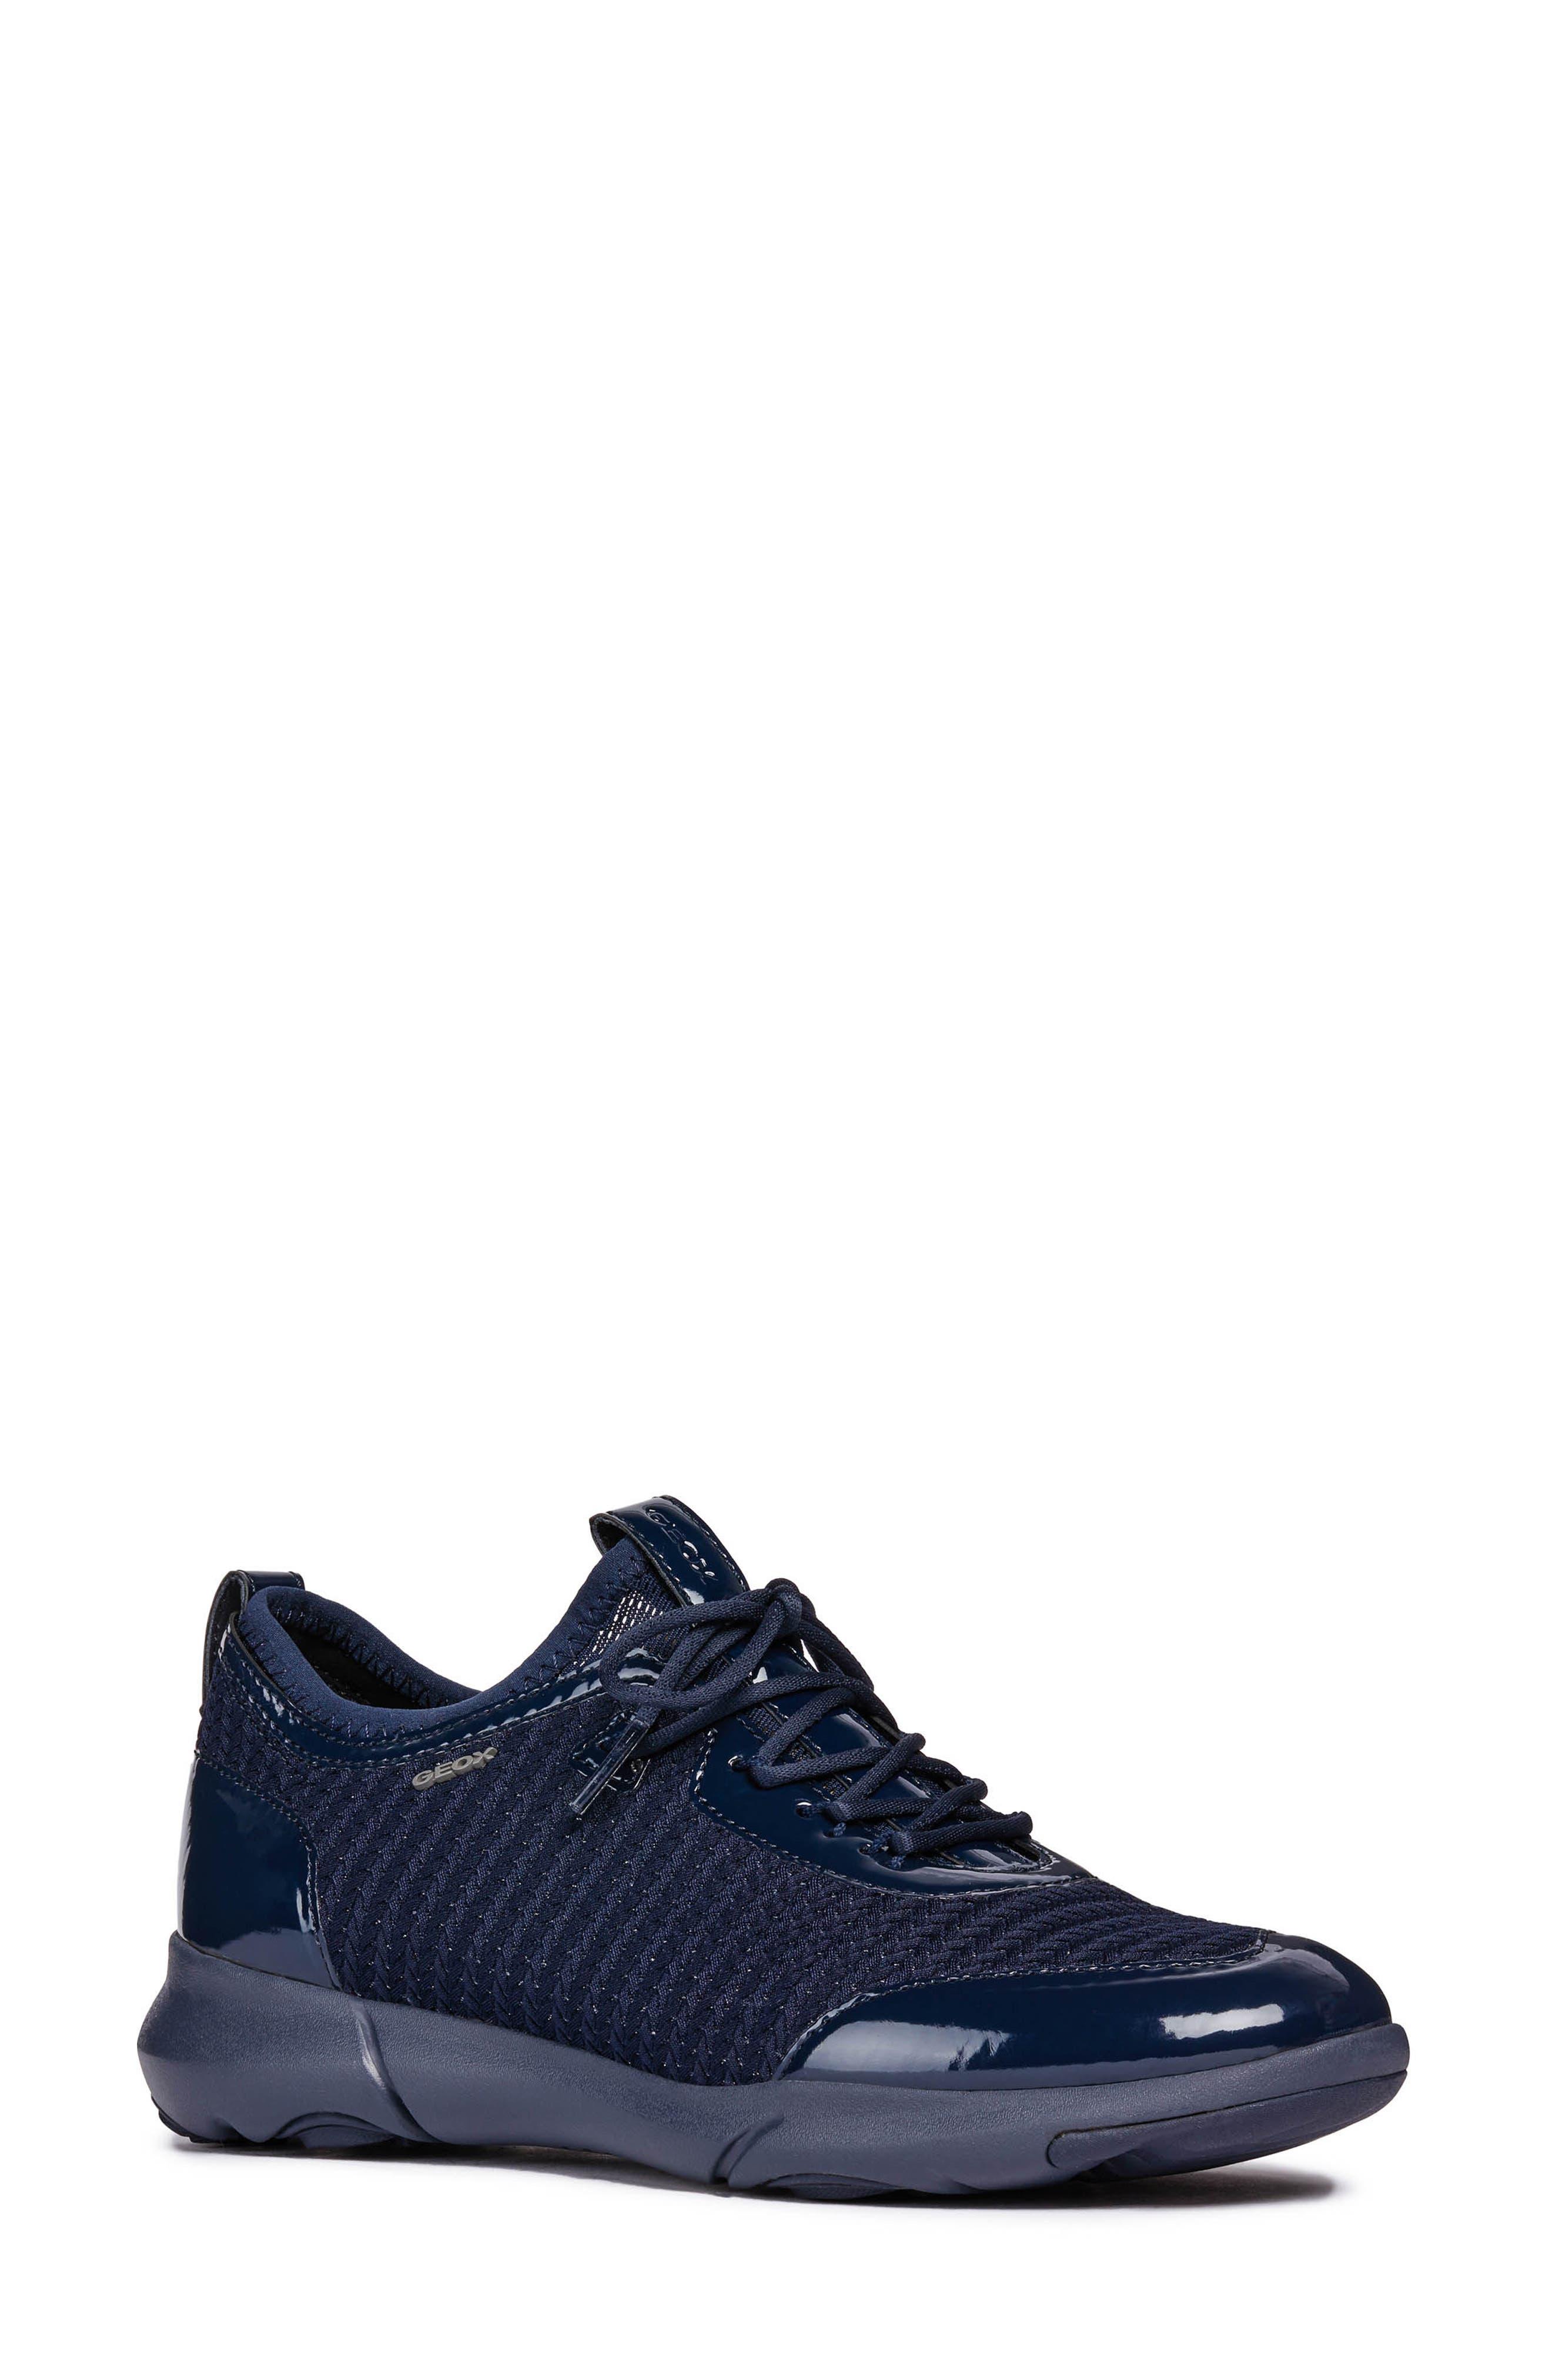 Nebula X Sneaker,                             Main thumbnail 1, color,                             NAVY FABRIC